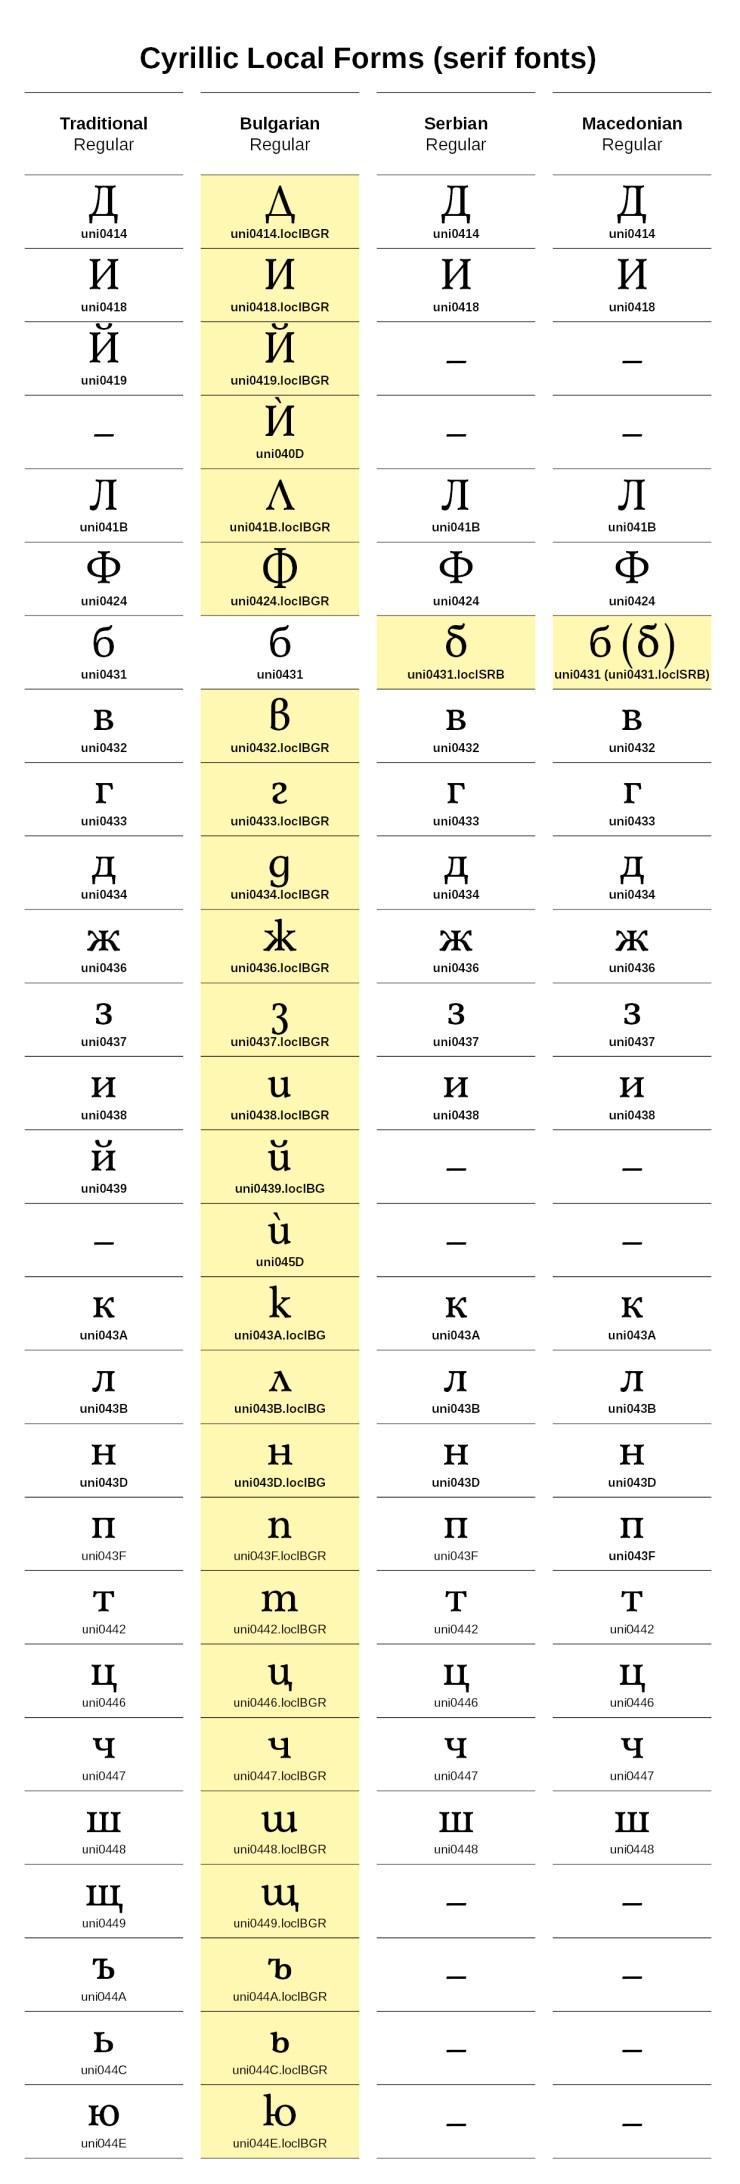 Cyrillic Local Forms